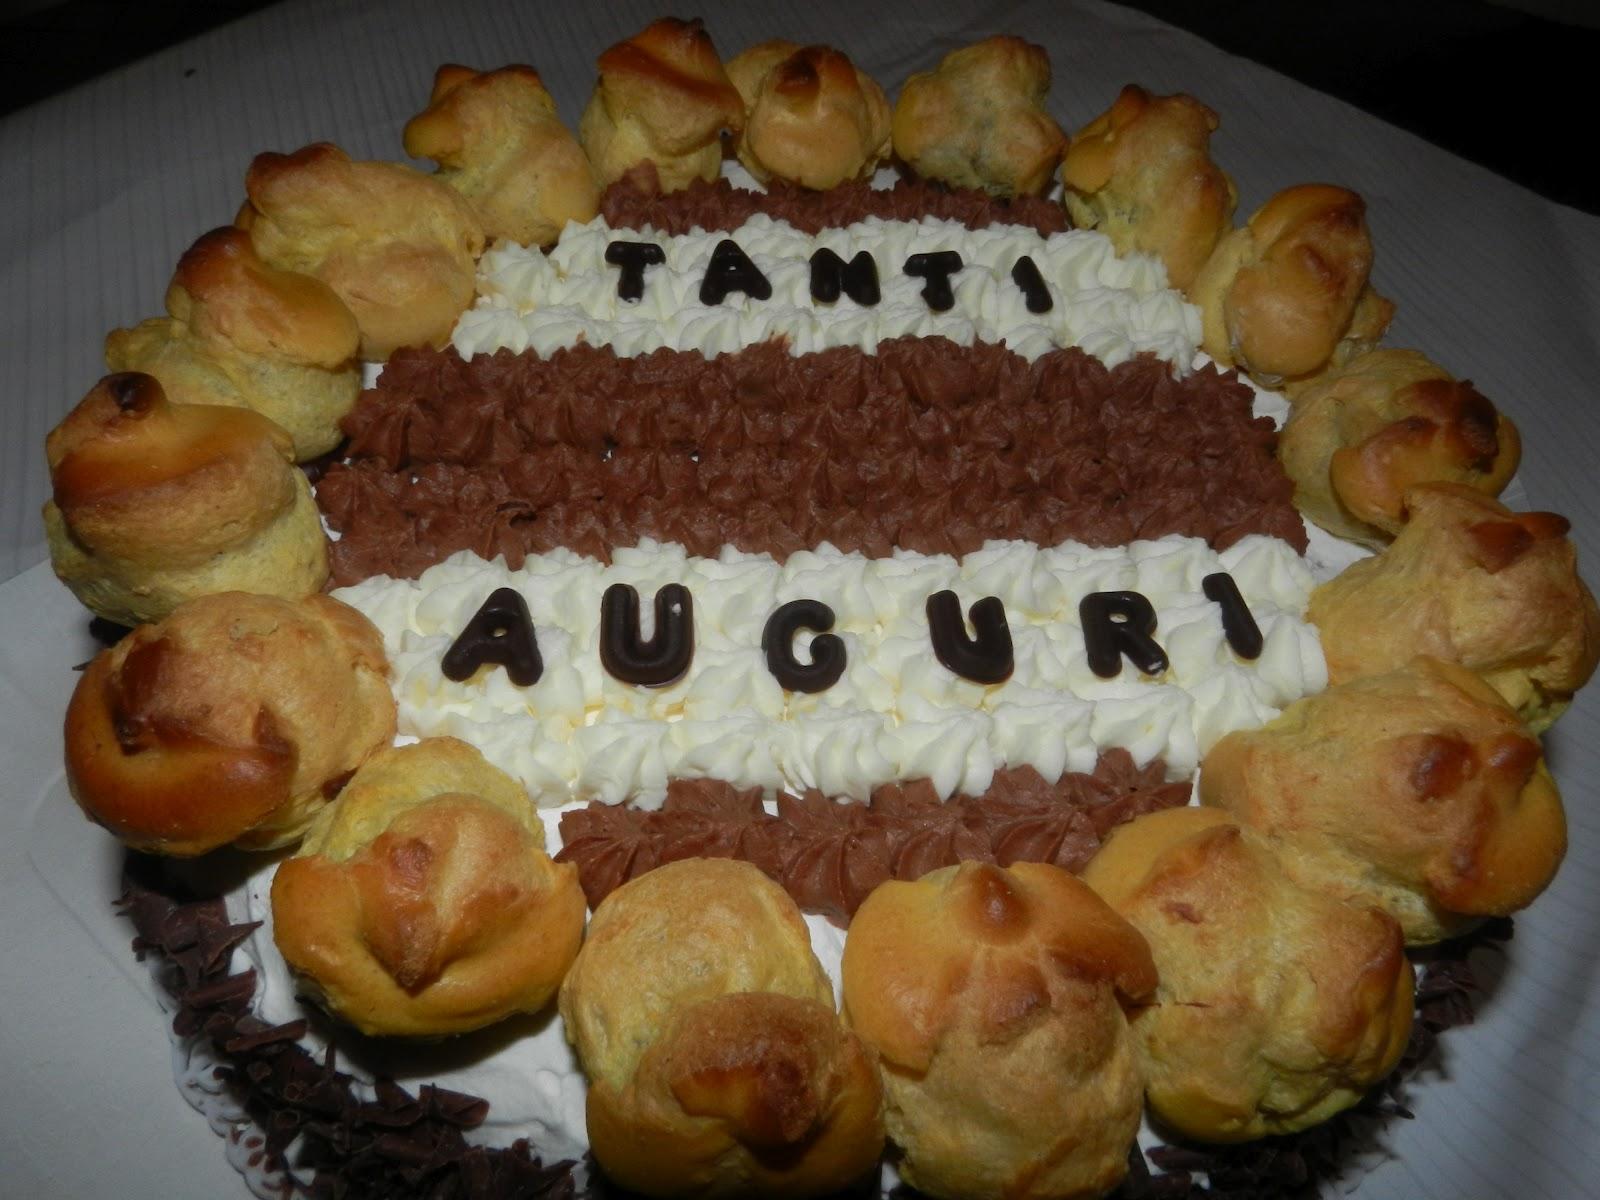 Le ricette di nonna celeste torta saint honor for Isola di saint honore caraibi